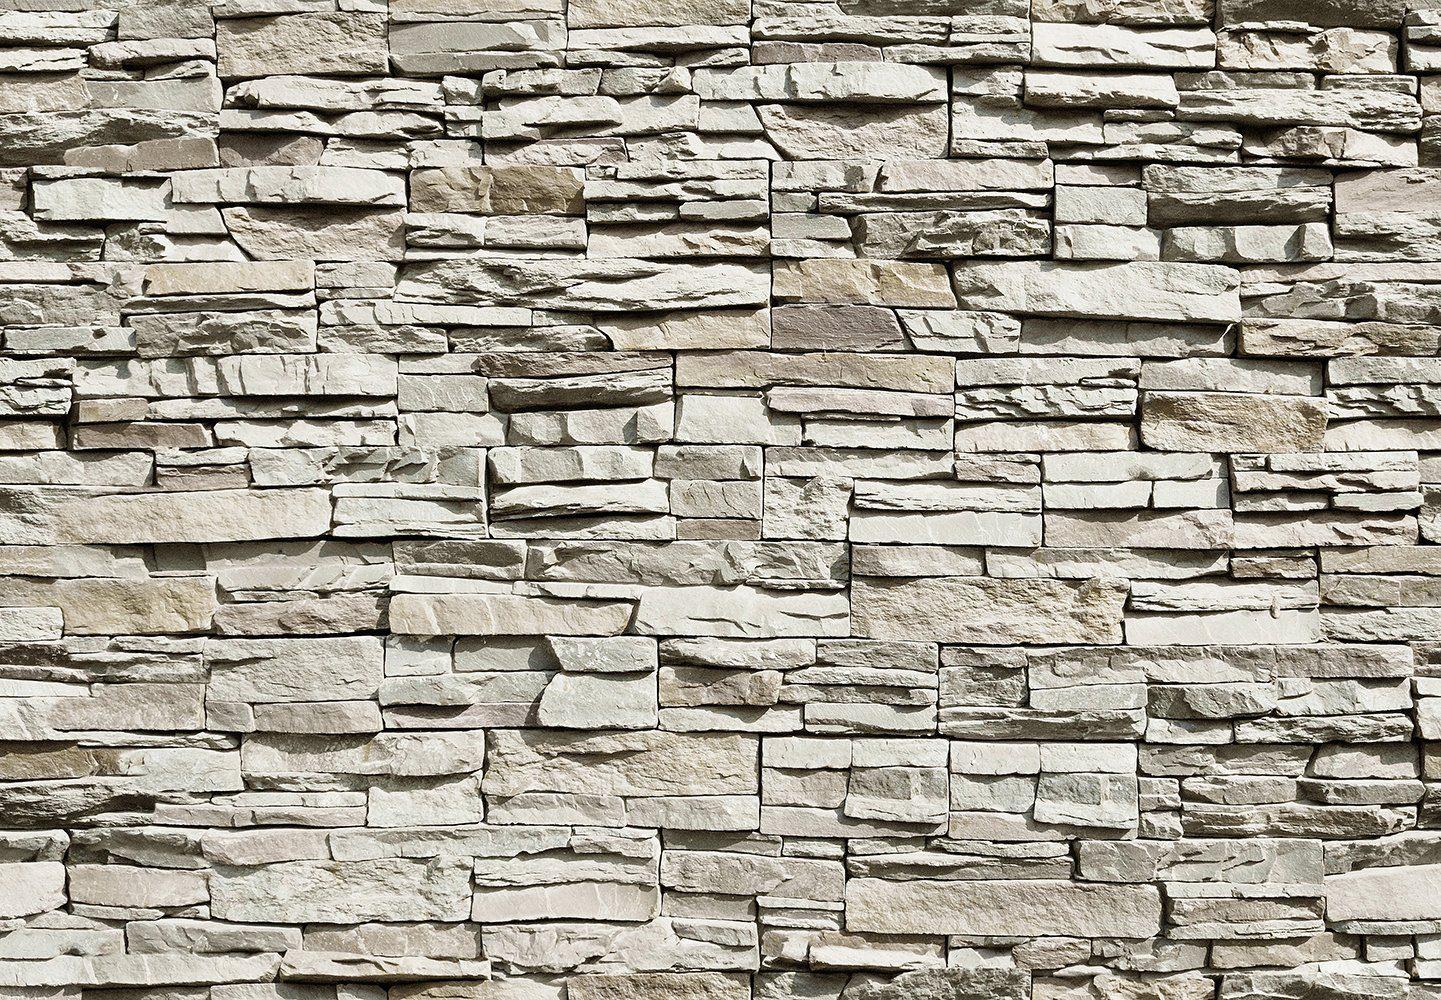 Fototapete »The Wall«, 8-teilig, 366x254 cm